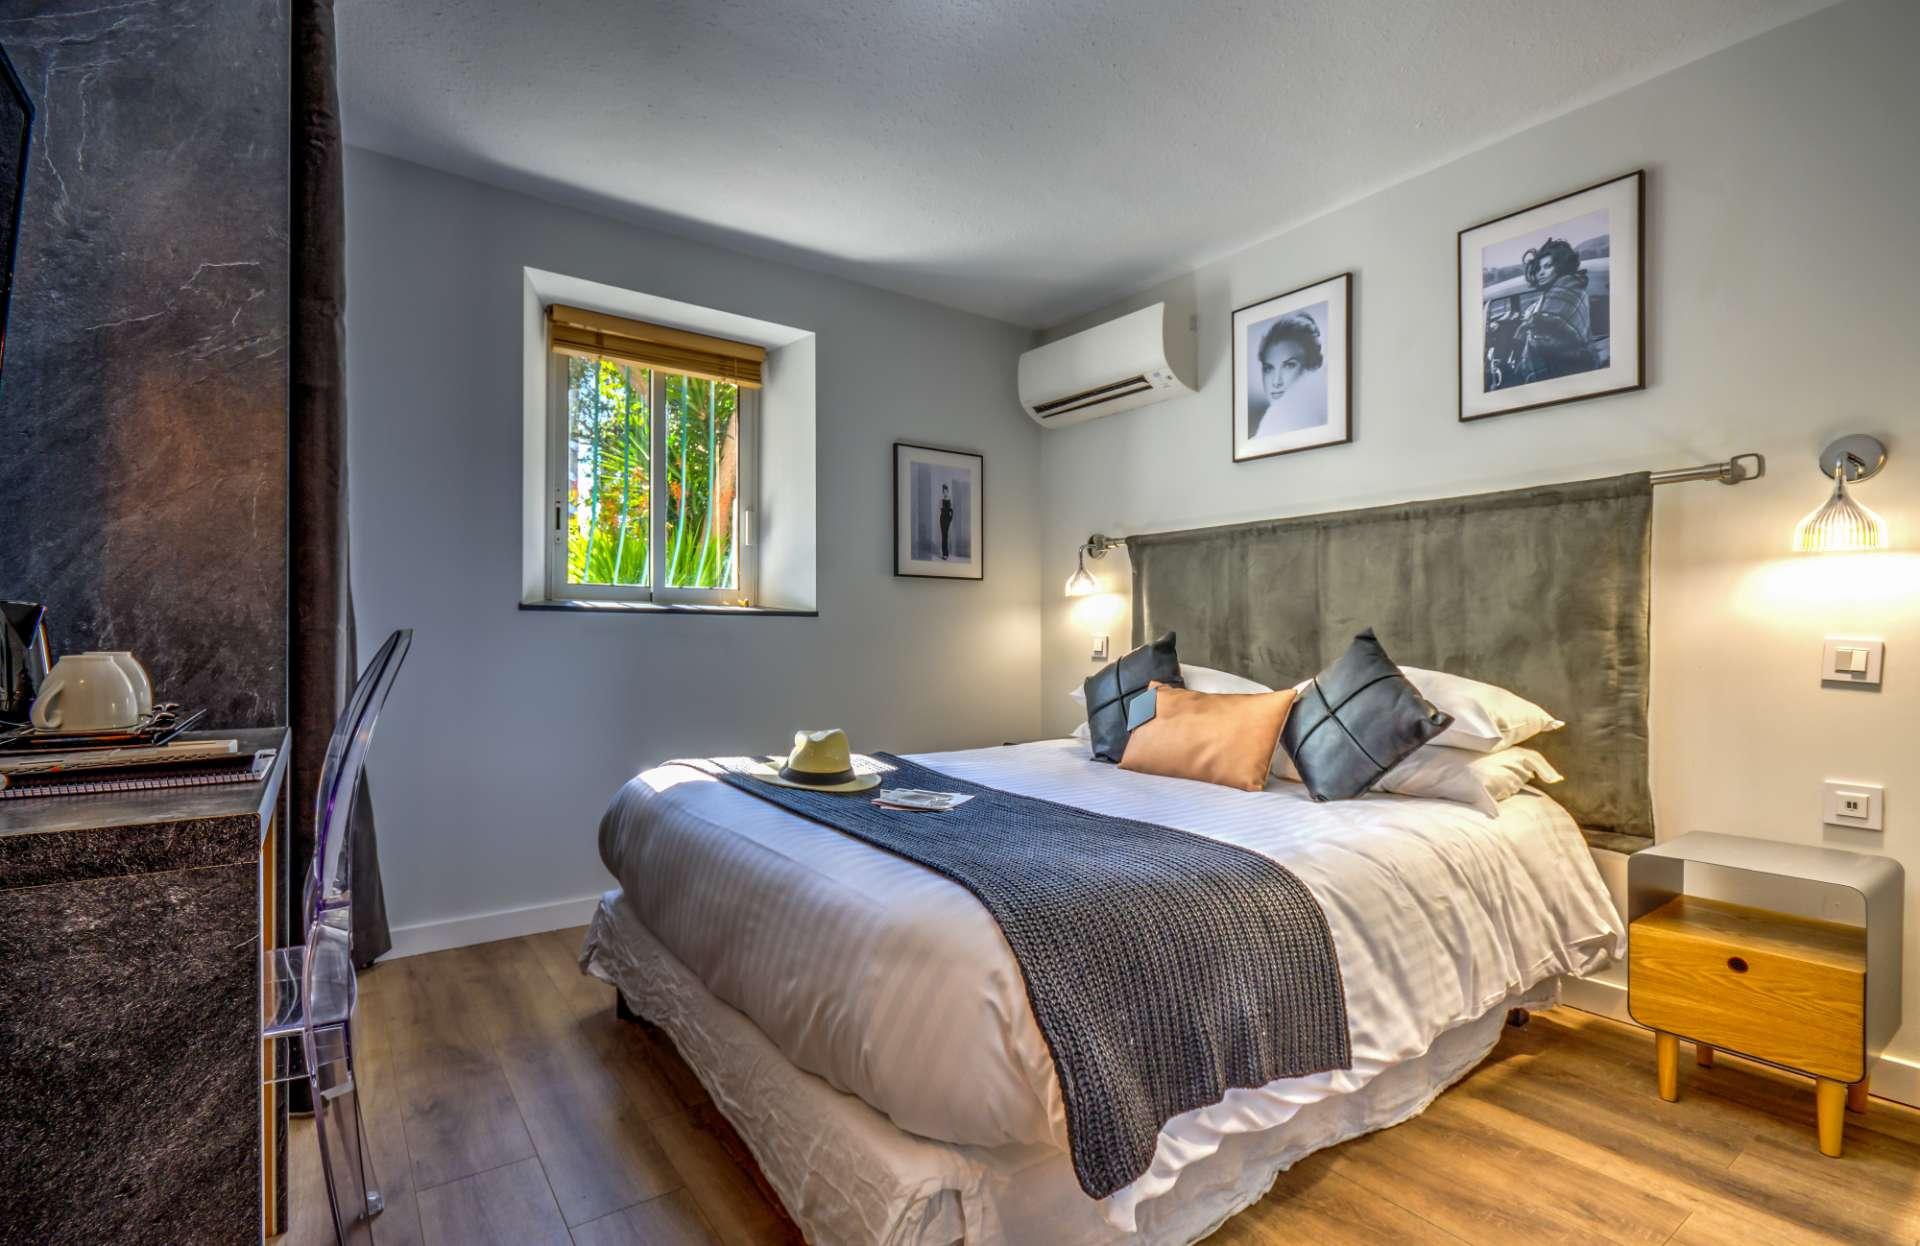 Villa Cannes SupérieuresHotel Nos Claudia Chambres Nn8m0Ovw